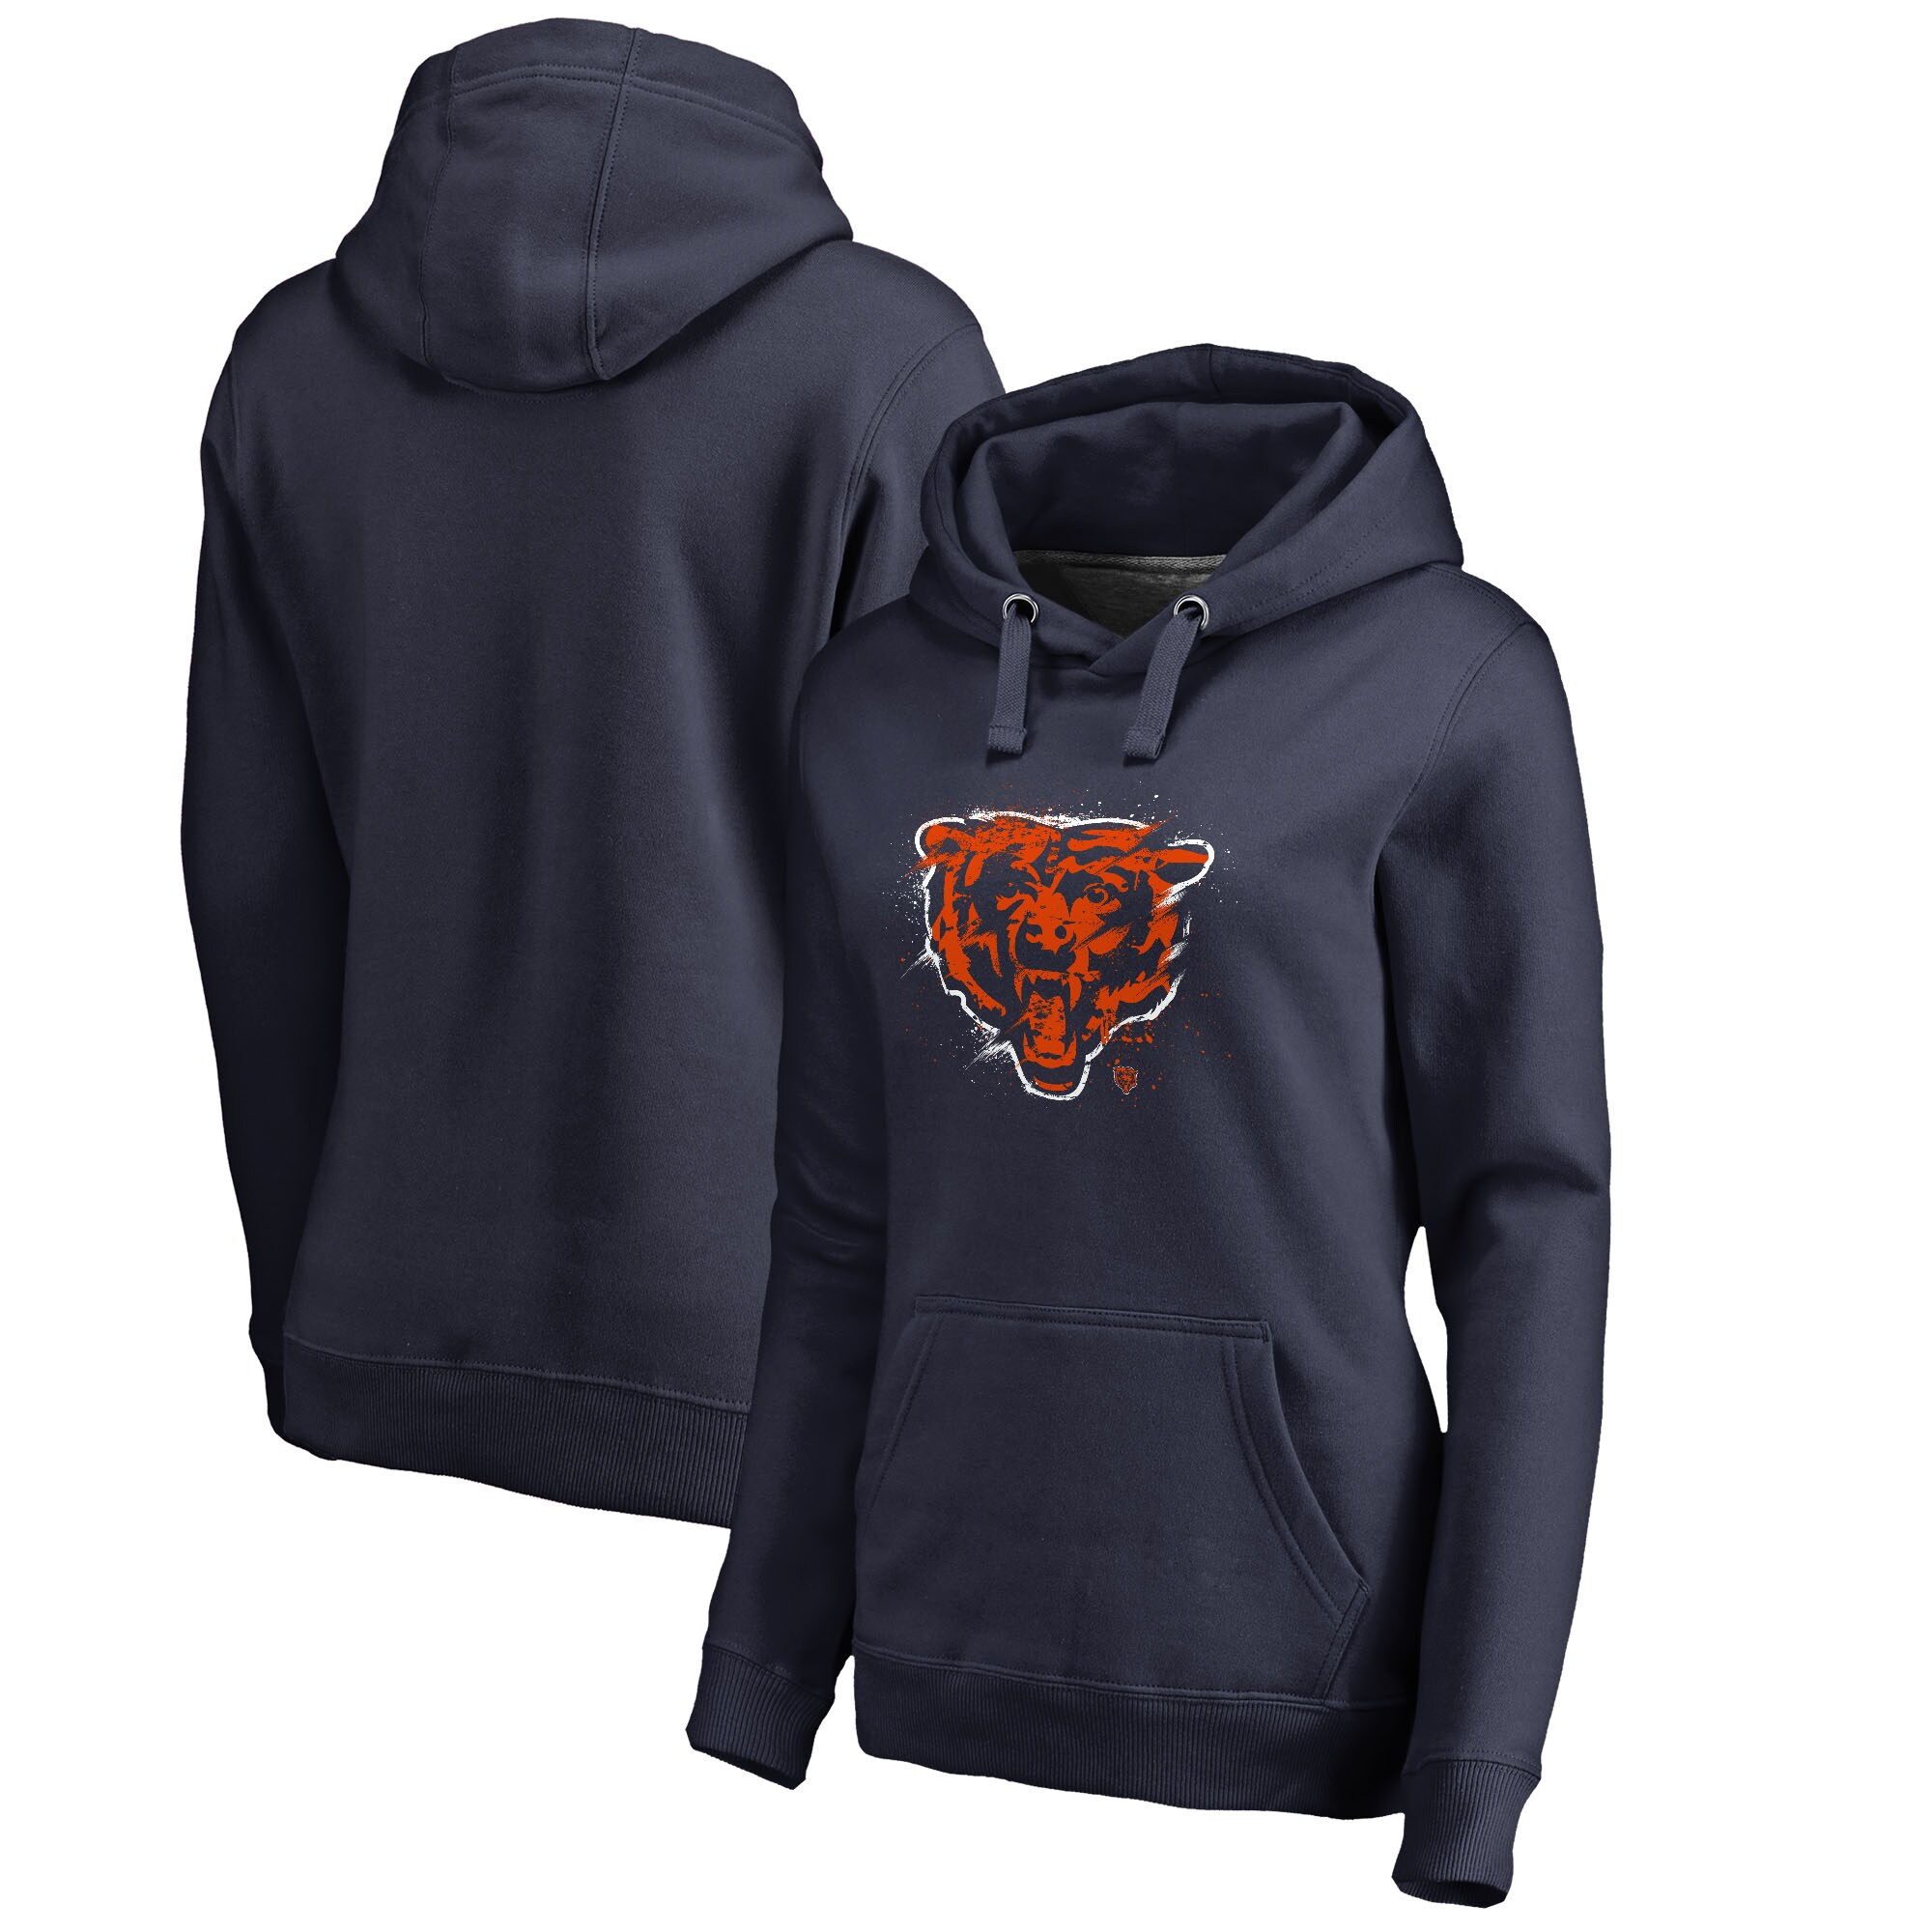 Chicago Bears NFL Pro Line by Fanatics Branded Women's Splatter Logo Pullover Hoodie - Navy